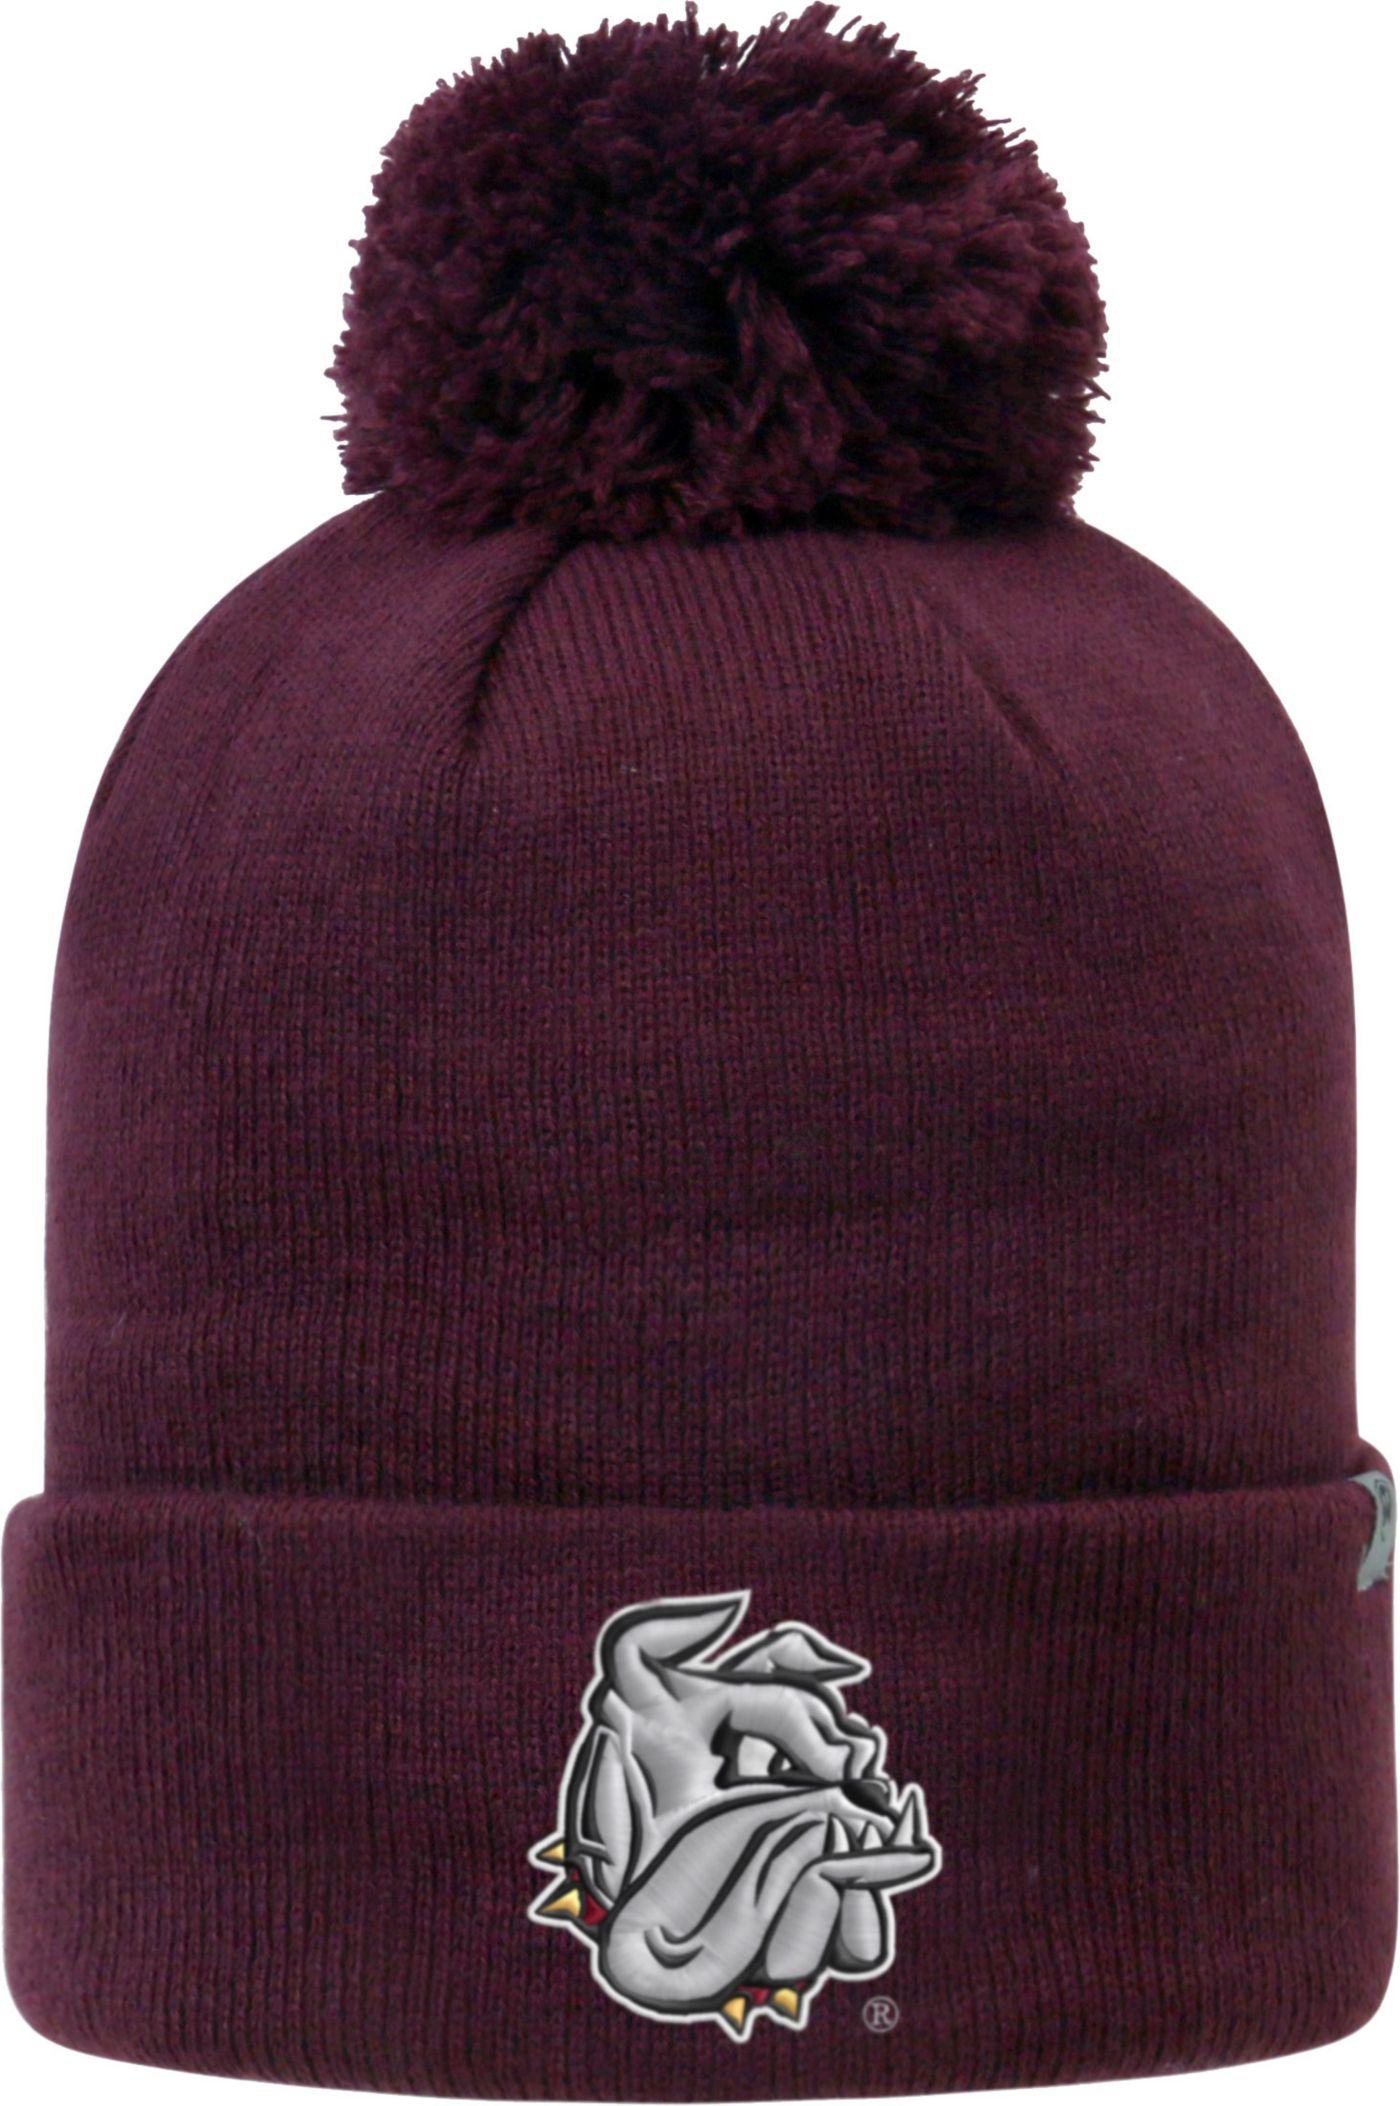 Top of the World Men's Minnesota-Duluth  Bulldogs Maroon Pom Knit Beanie